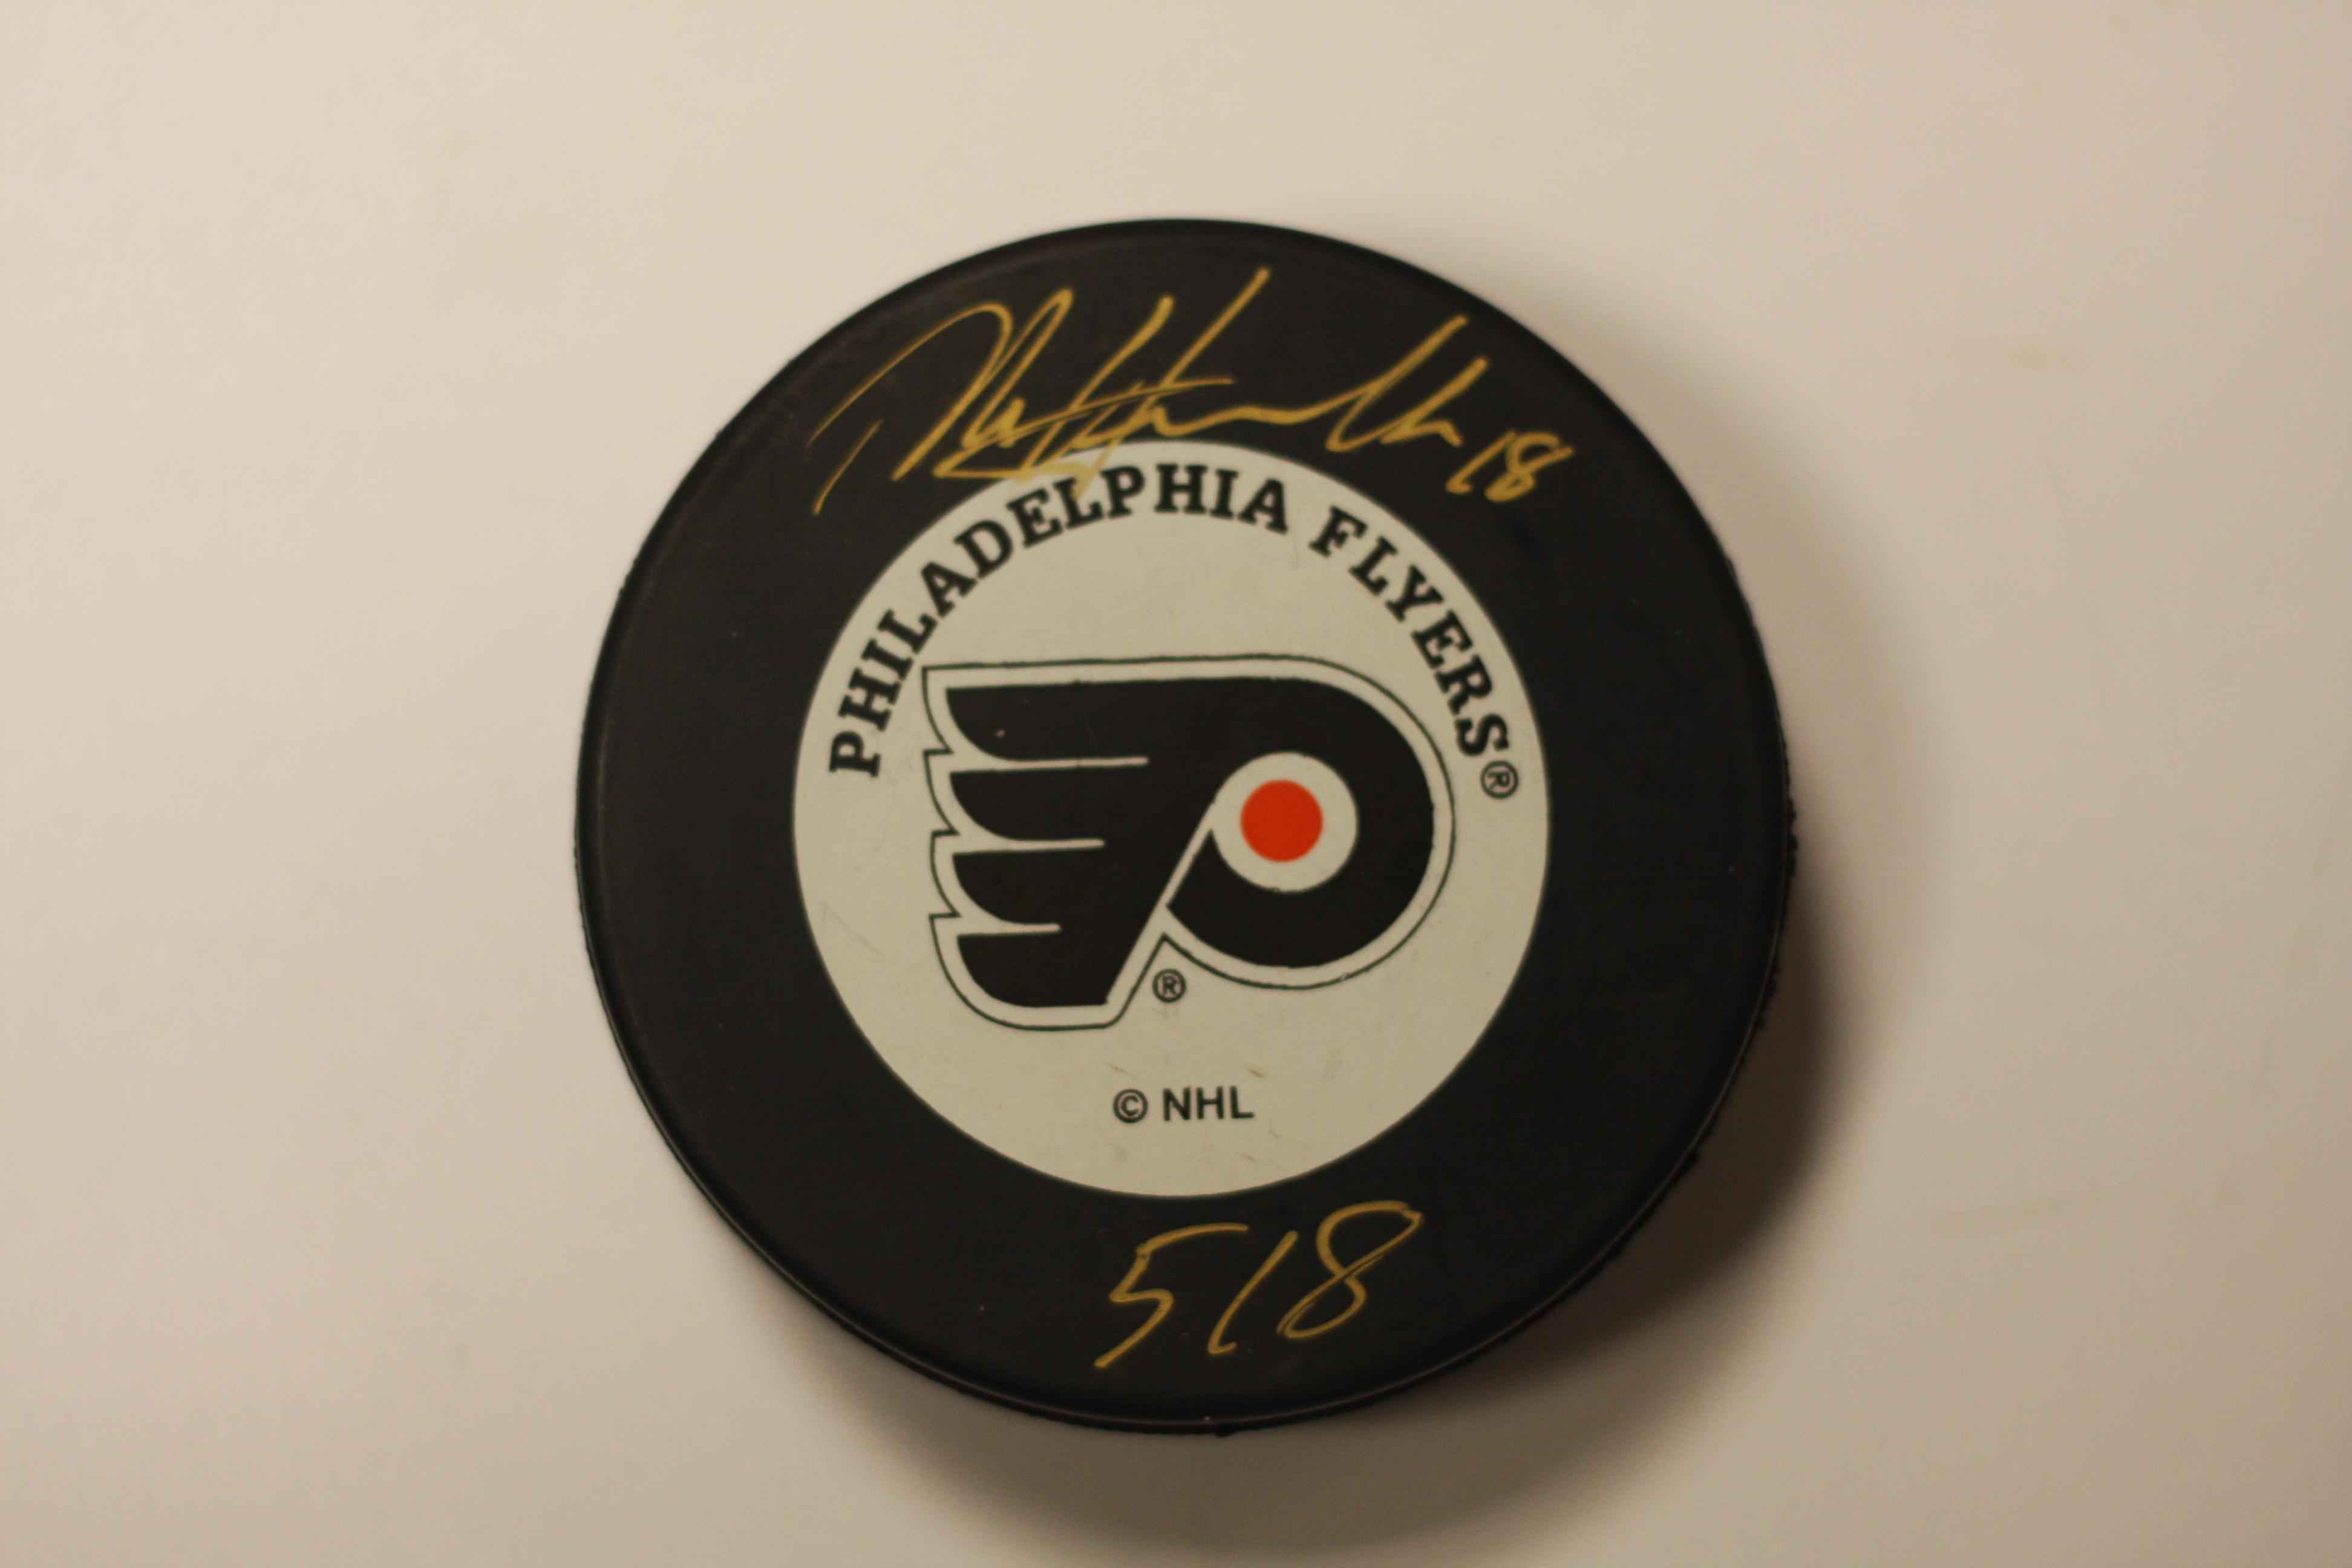 huge sale 55da7 b49f2 Dale Hawerchuck Philadelphia Flyers signed puck 518 Inscr